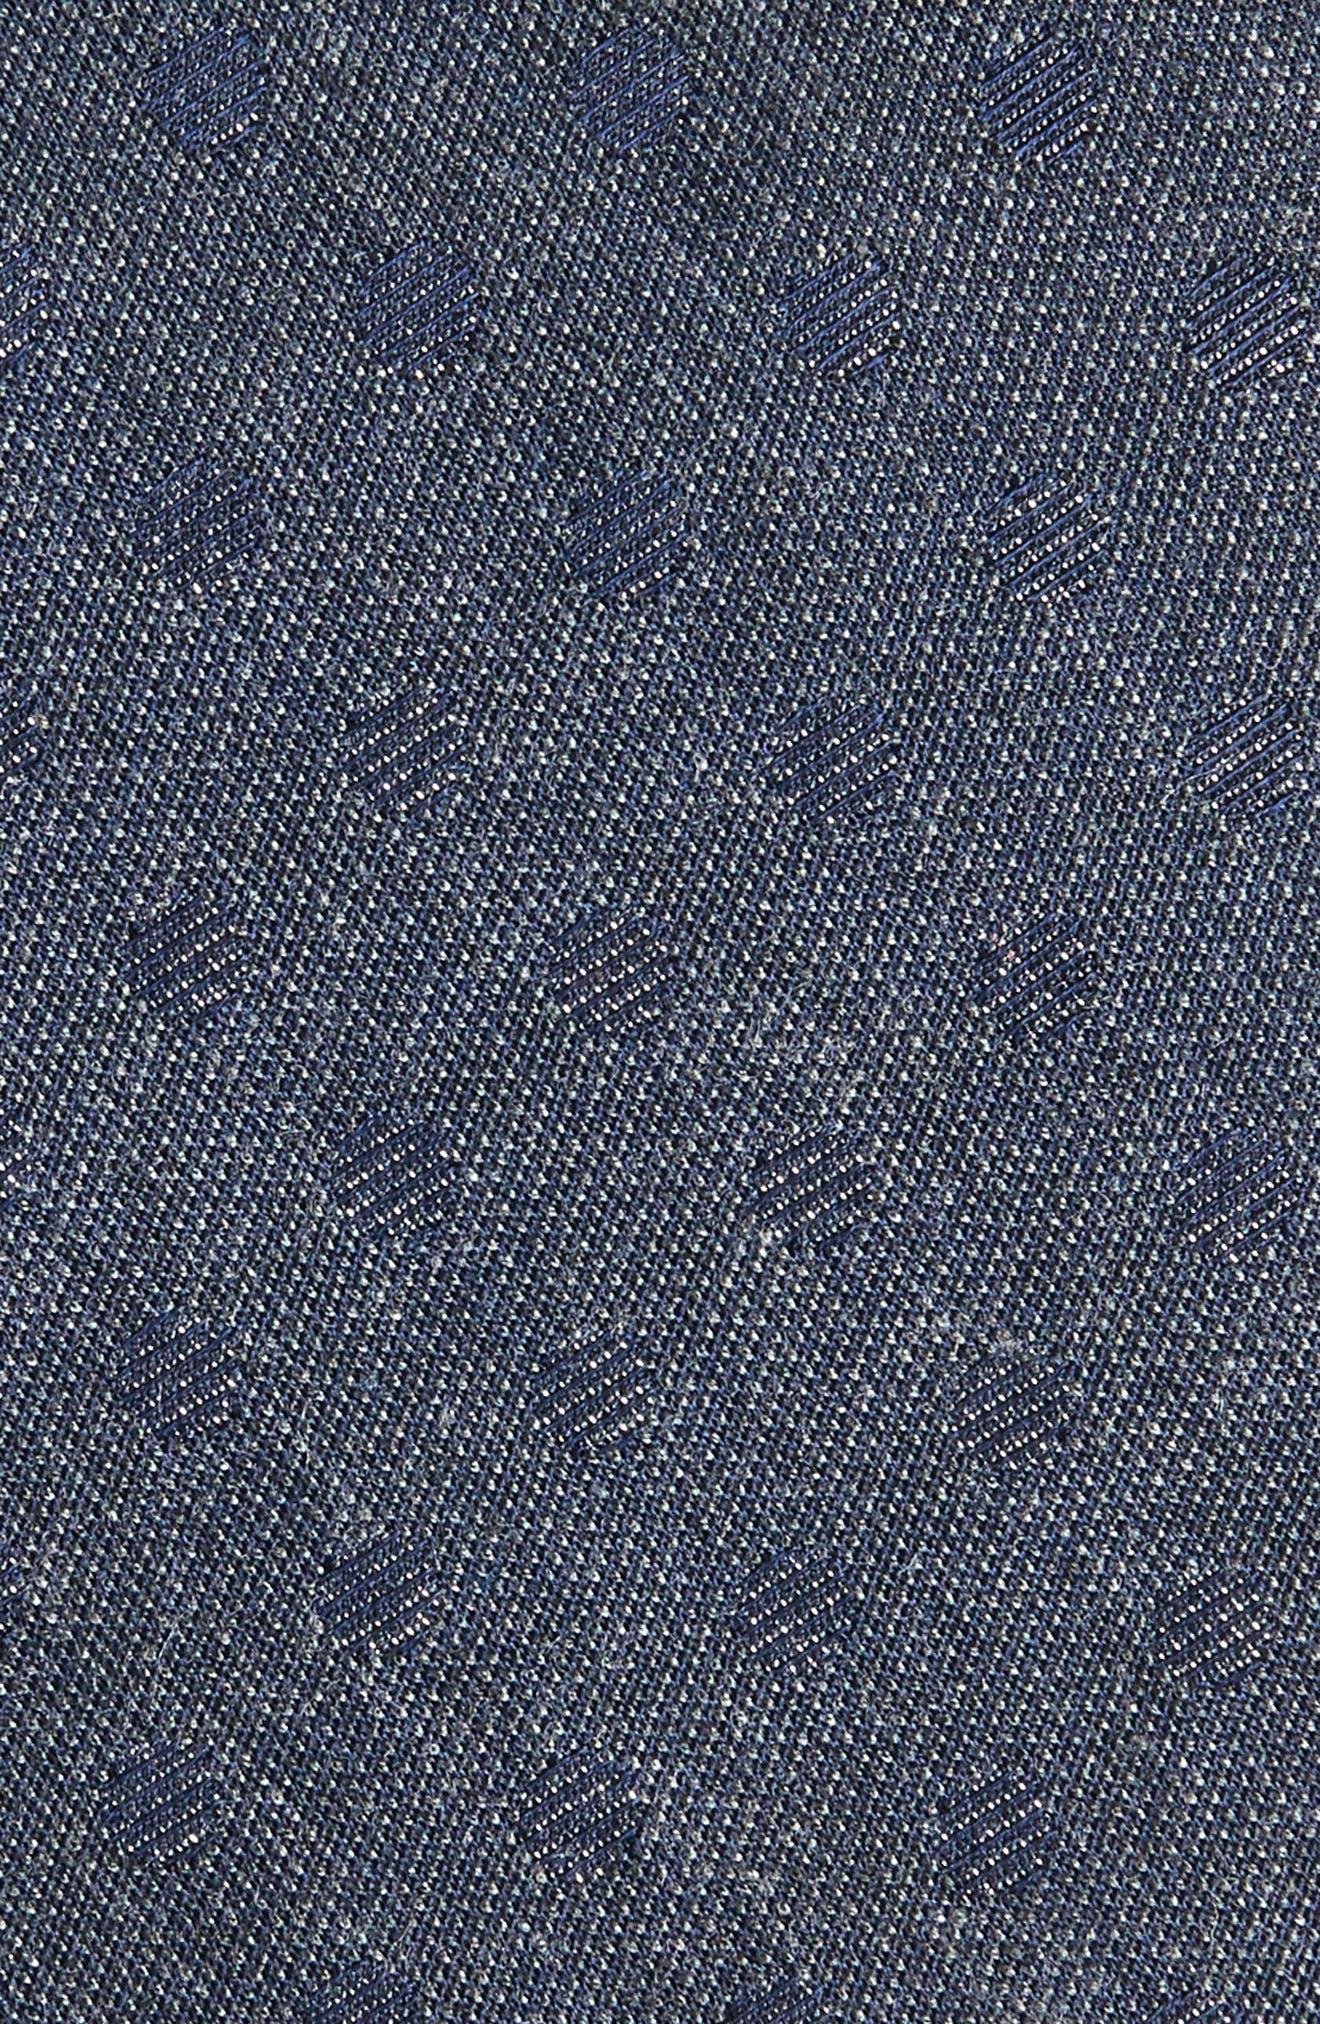 Lang Dot Tie,                             Alternate thumbnail 5, color,